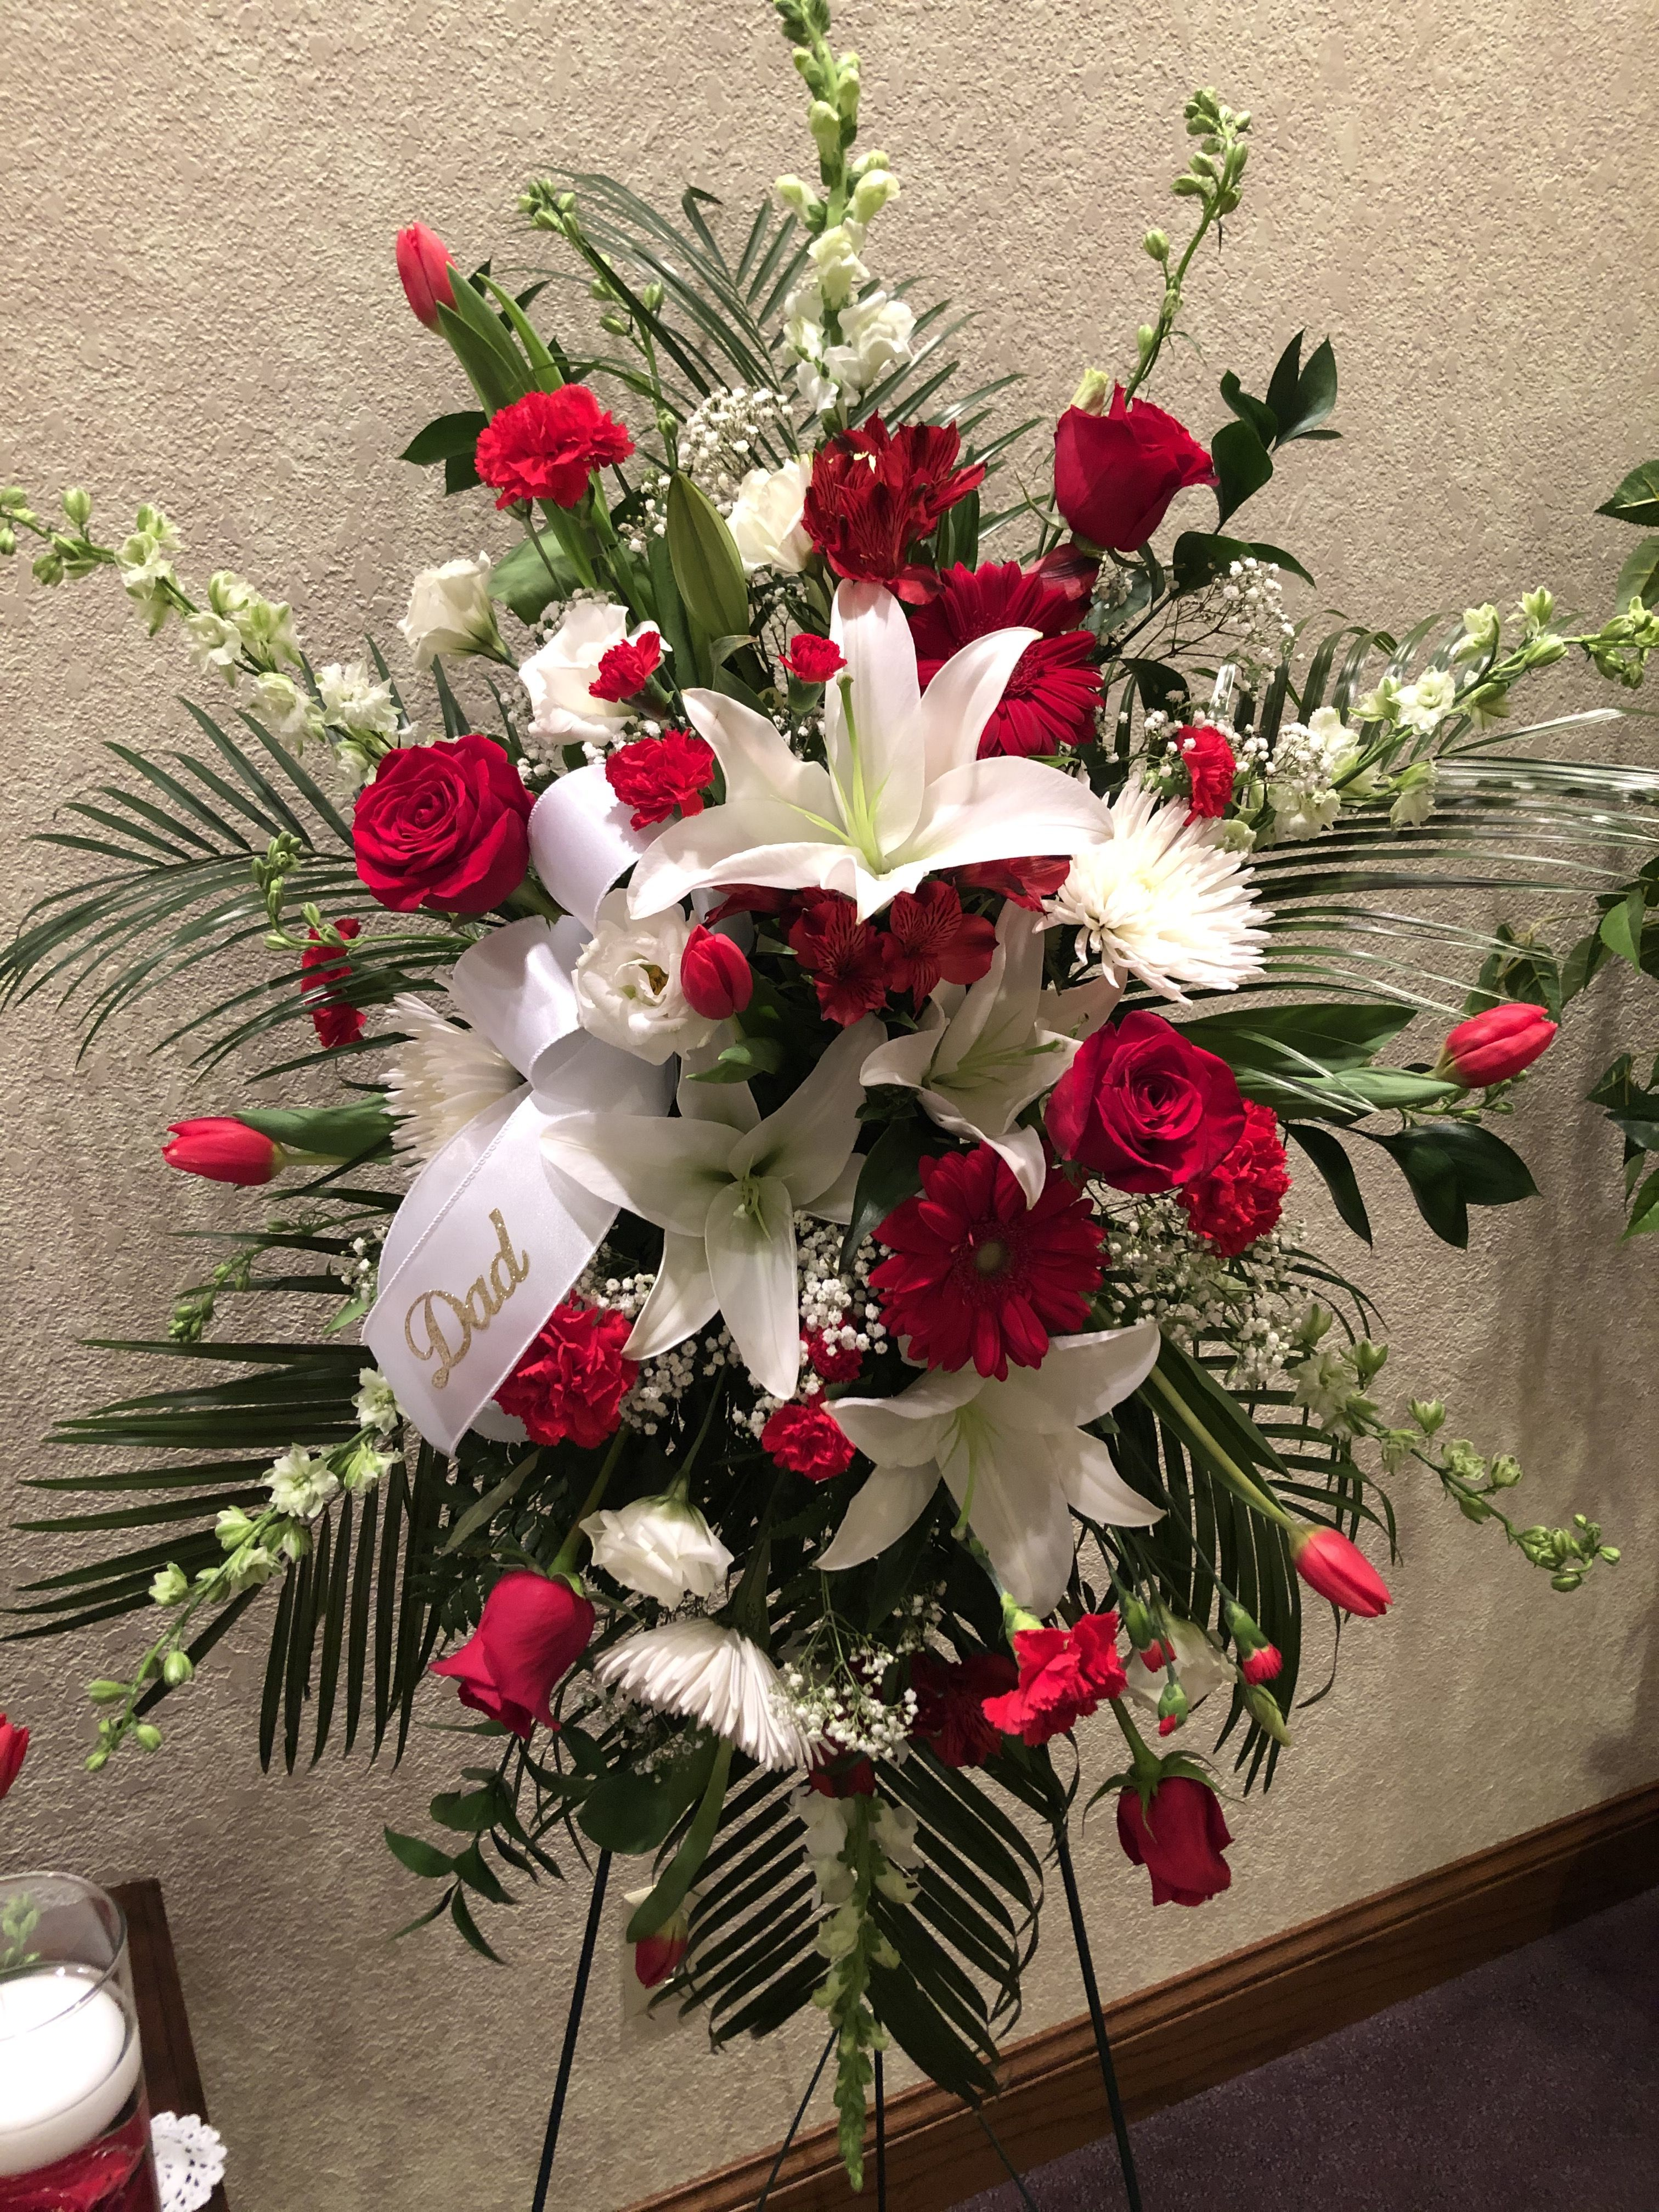 Pin By Twigs Vines Floral On Flower Arrangements In 2020 Christmas Wreaths Flower Arrangements Funeral Flower Arrangements